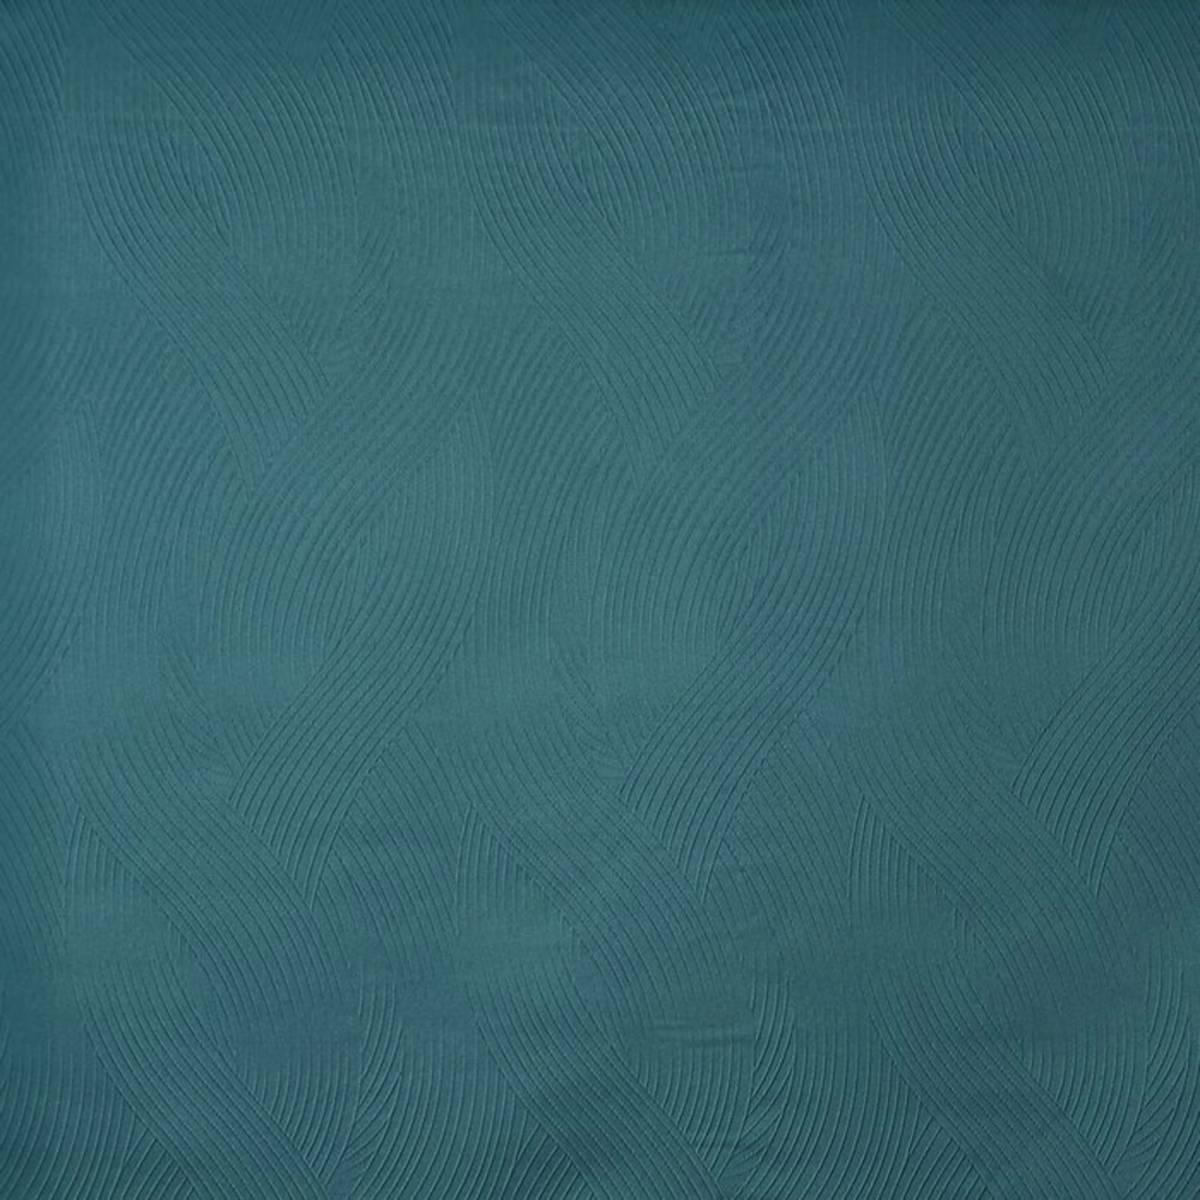 Tamara fabric teal 3597 117 prestigious textiles deco fabrics collection - Deco fabriek ...